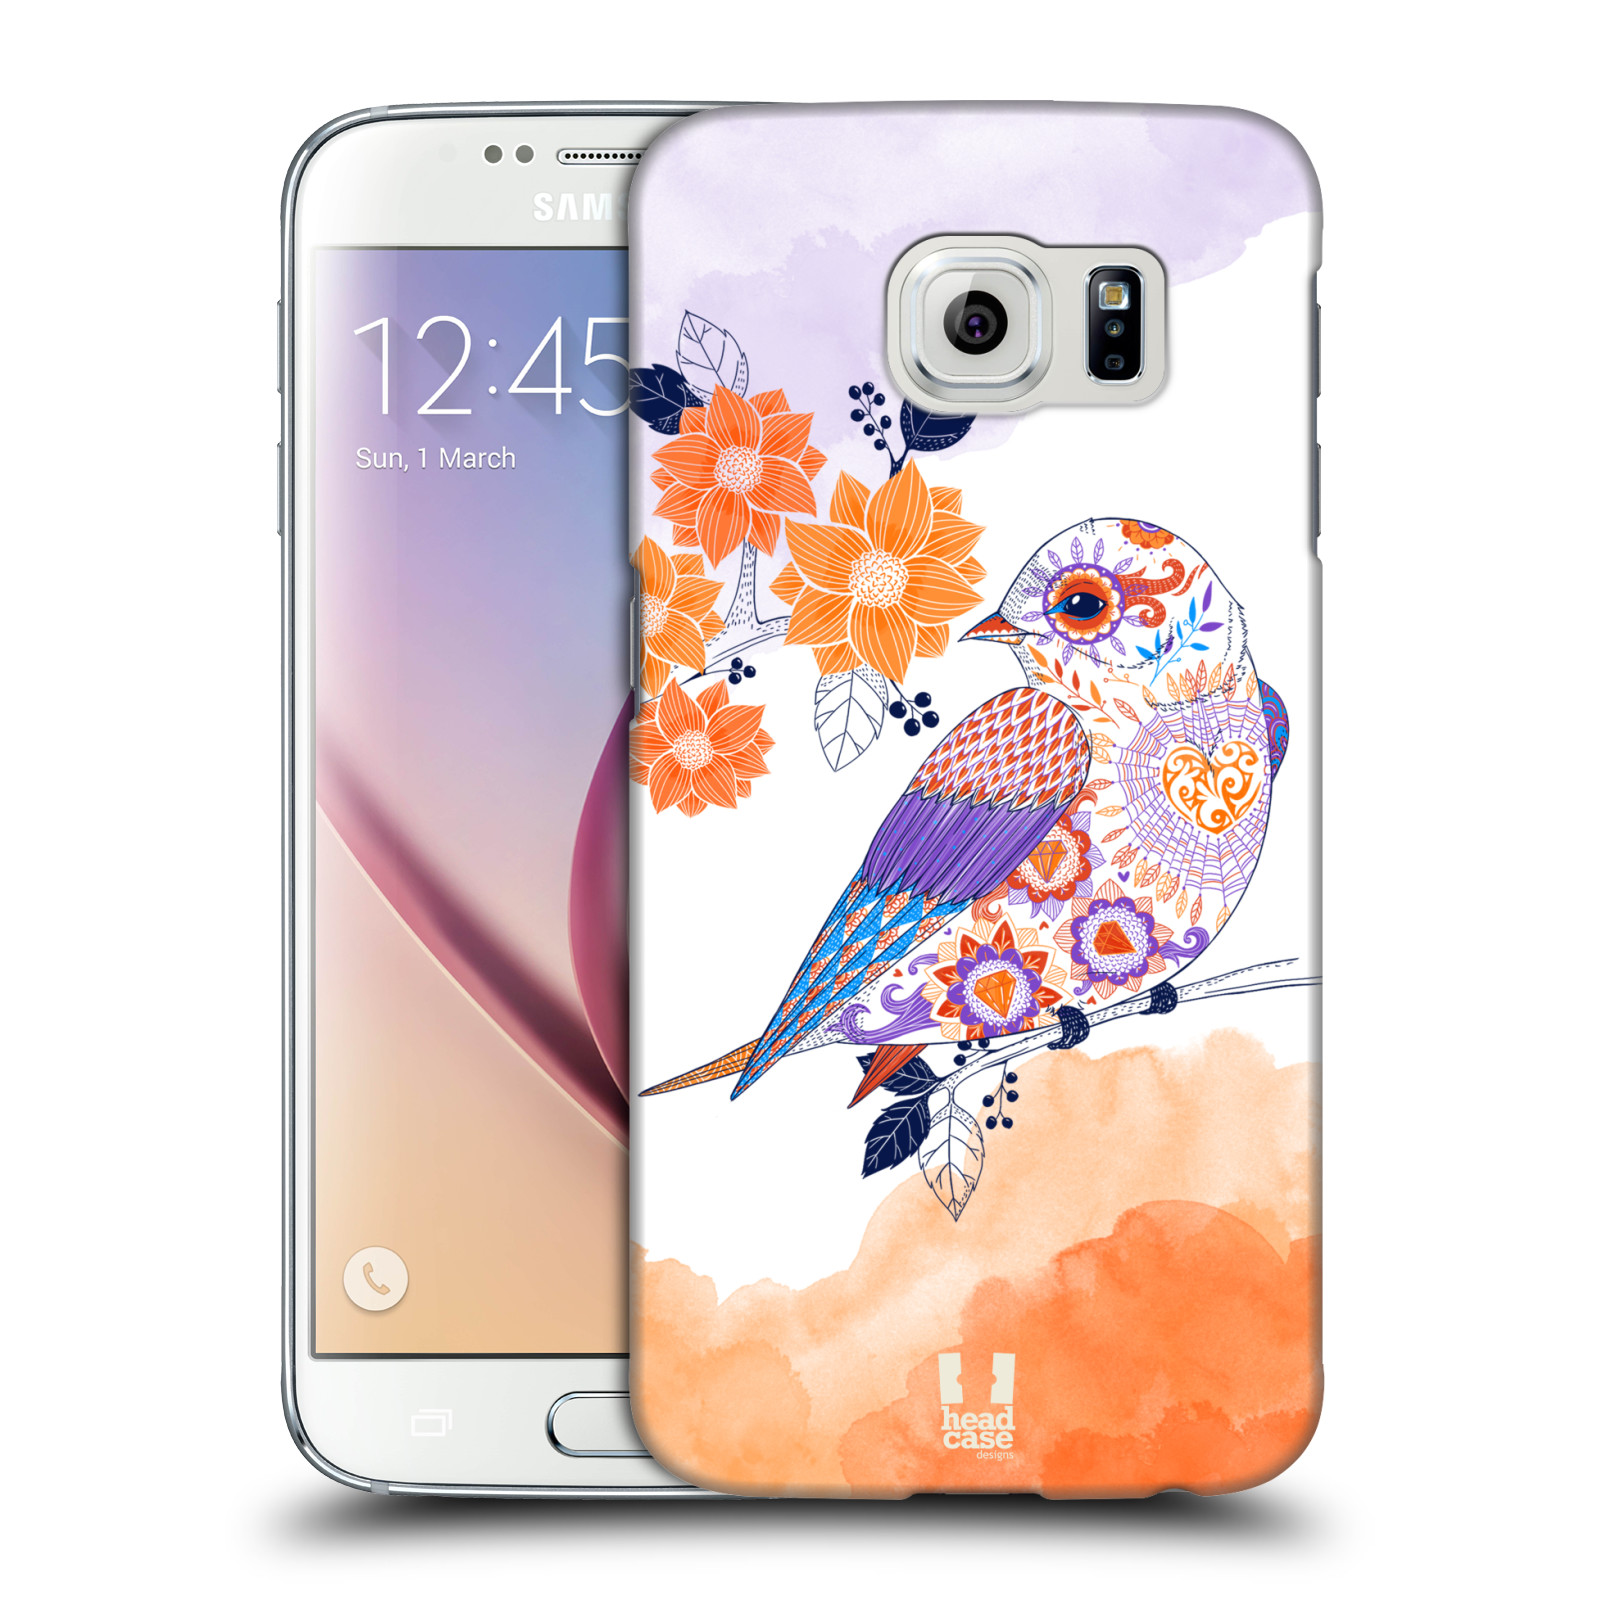 HEAD CASE plastový obal na mobil SAMSUNG Galaxy S6 (G9200, G920F) vzor Květina ptáčci ORANŽOVÁ